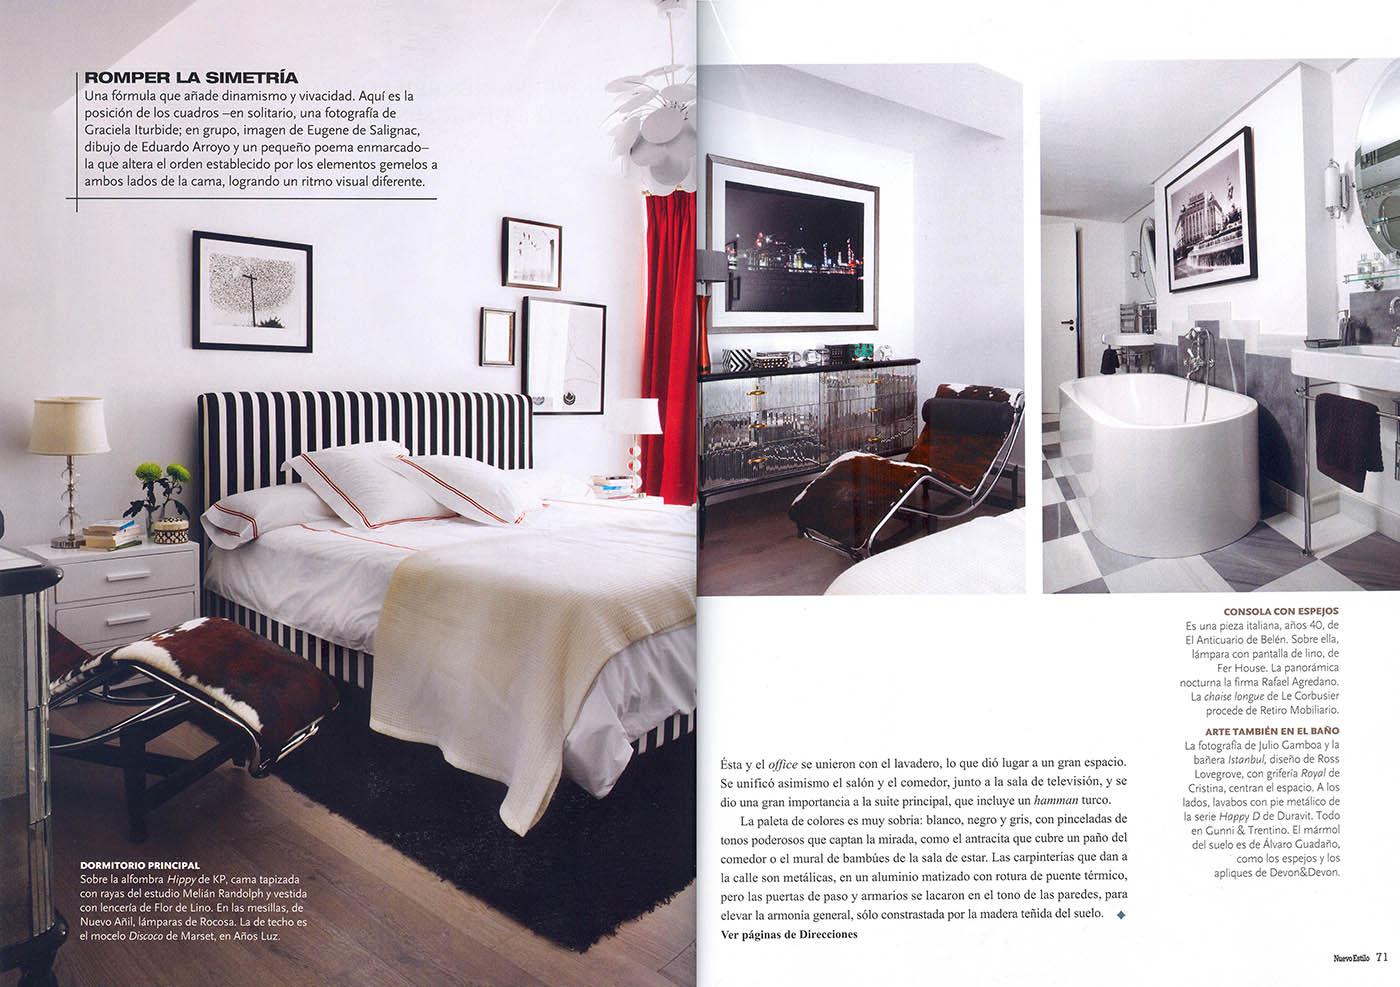 nuevo_estilo-melian_randolph-febrero-2012-8